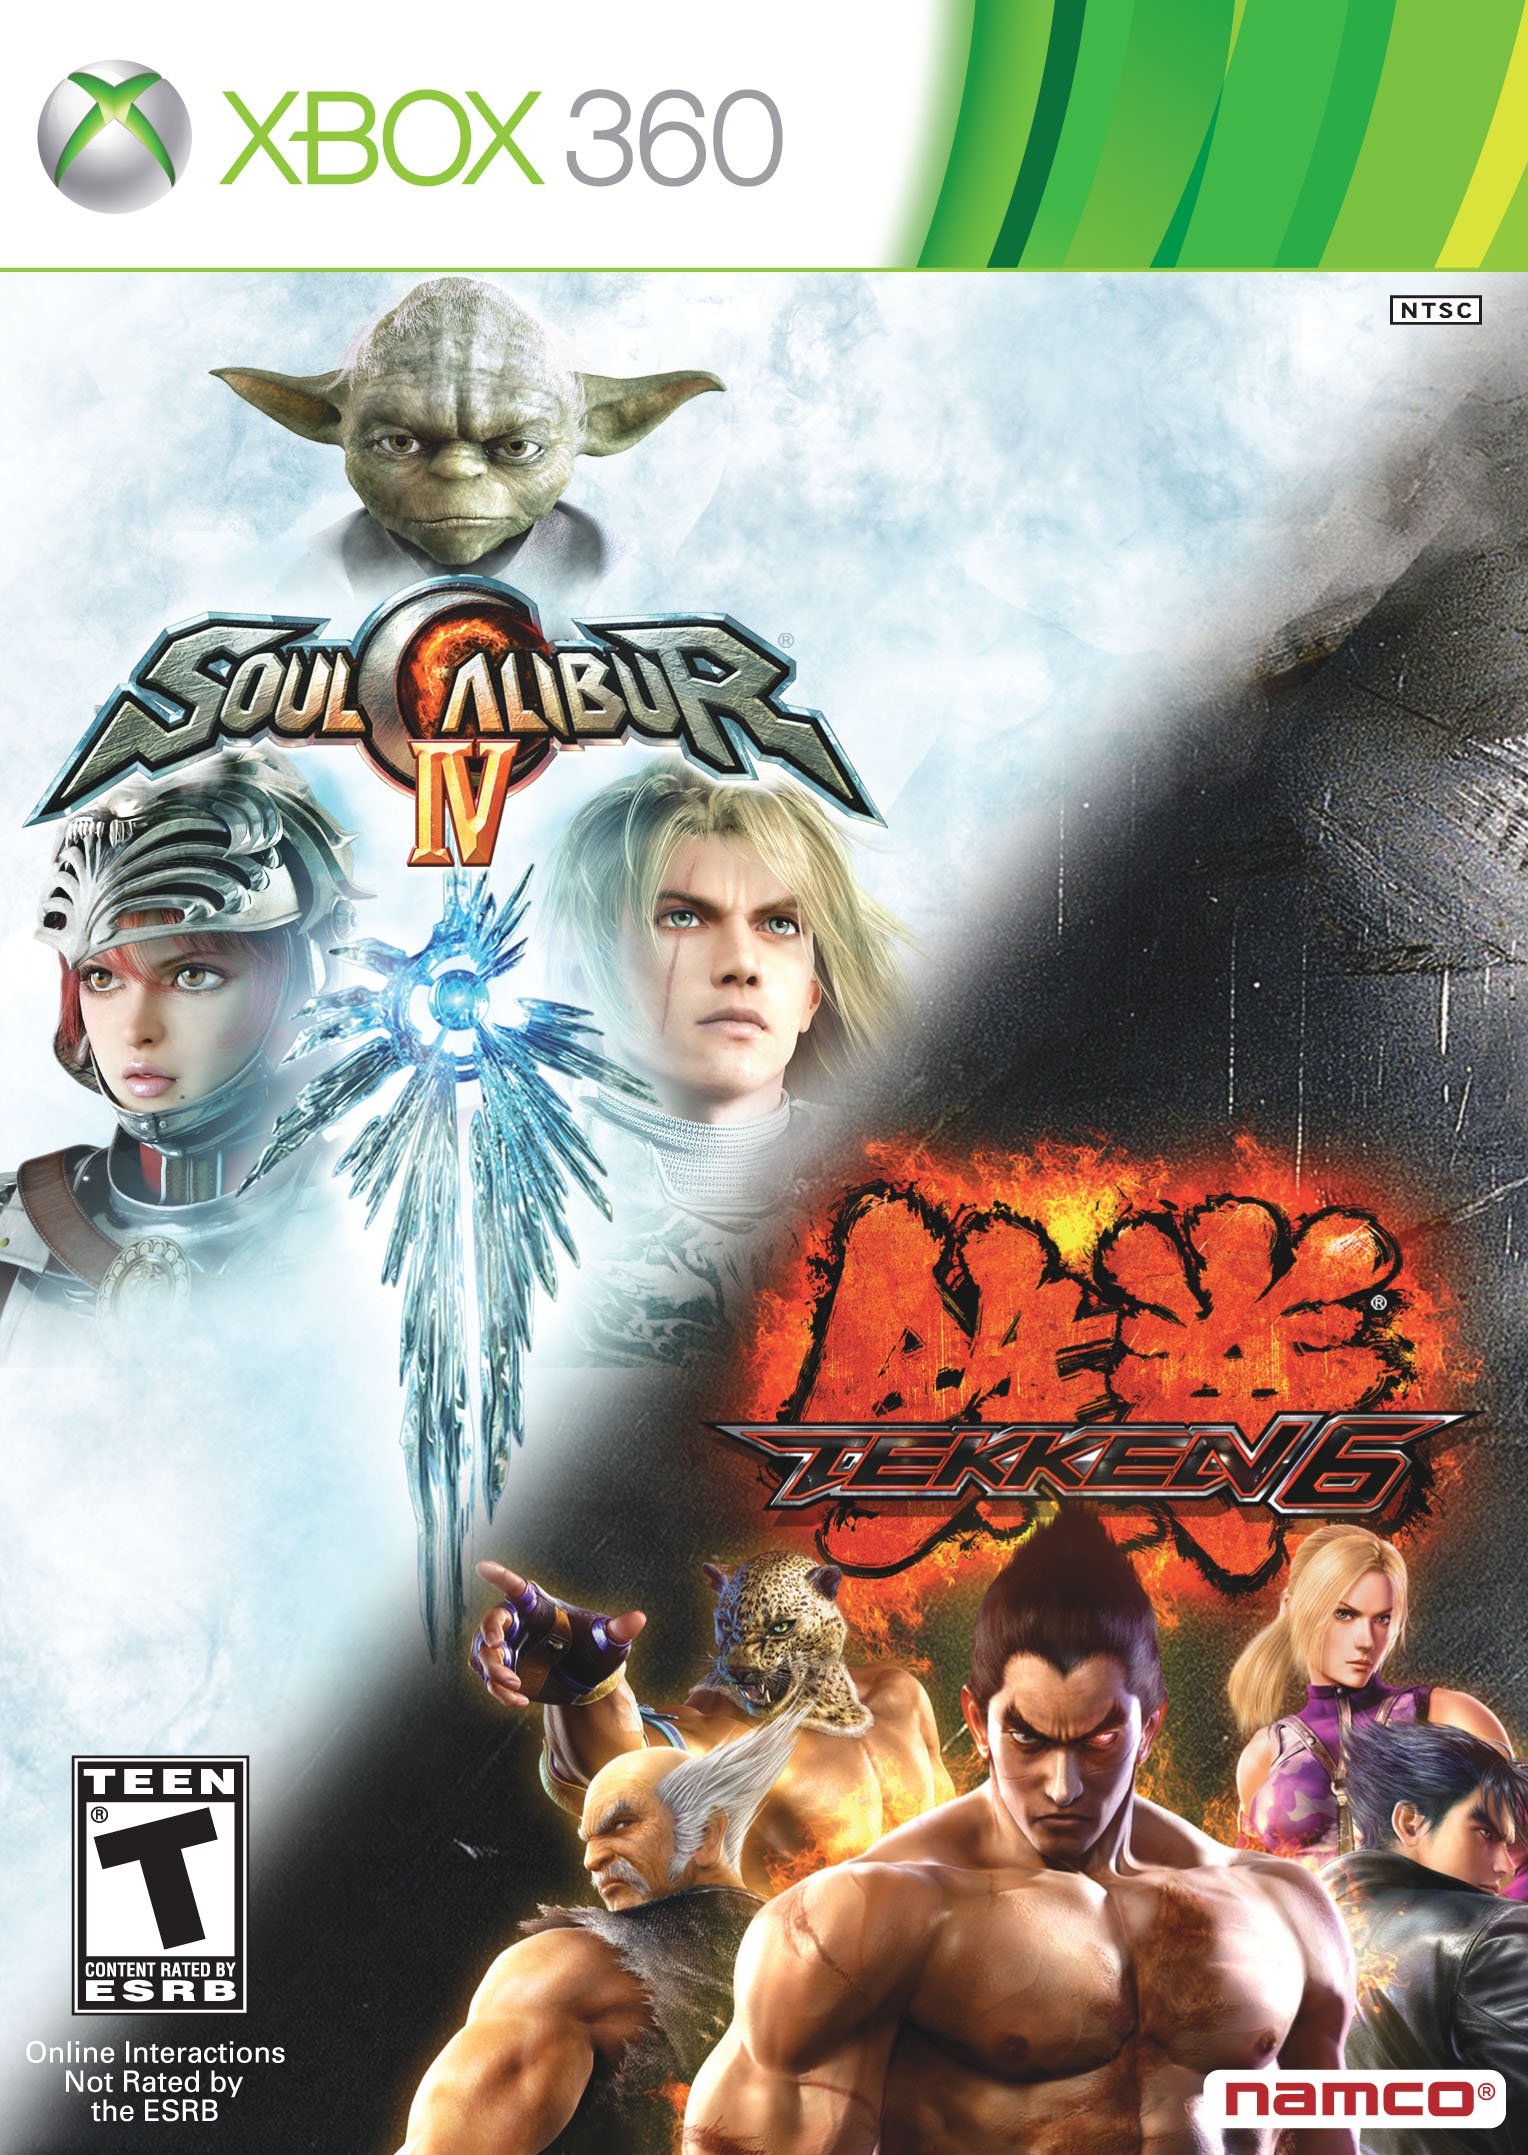 Namco Bandai Games Tekken 6 & Soul Calibur 4 - Juego (Xbox 360, Familia, T (Teen)): Amazon.es: Videojuegos